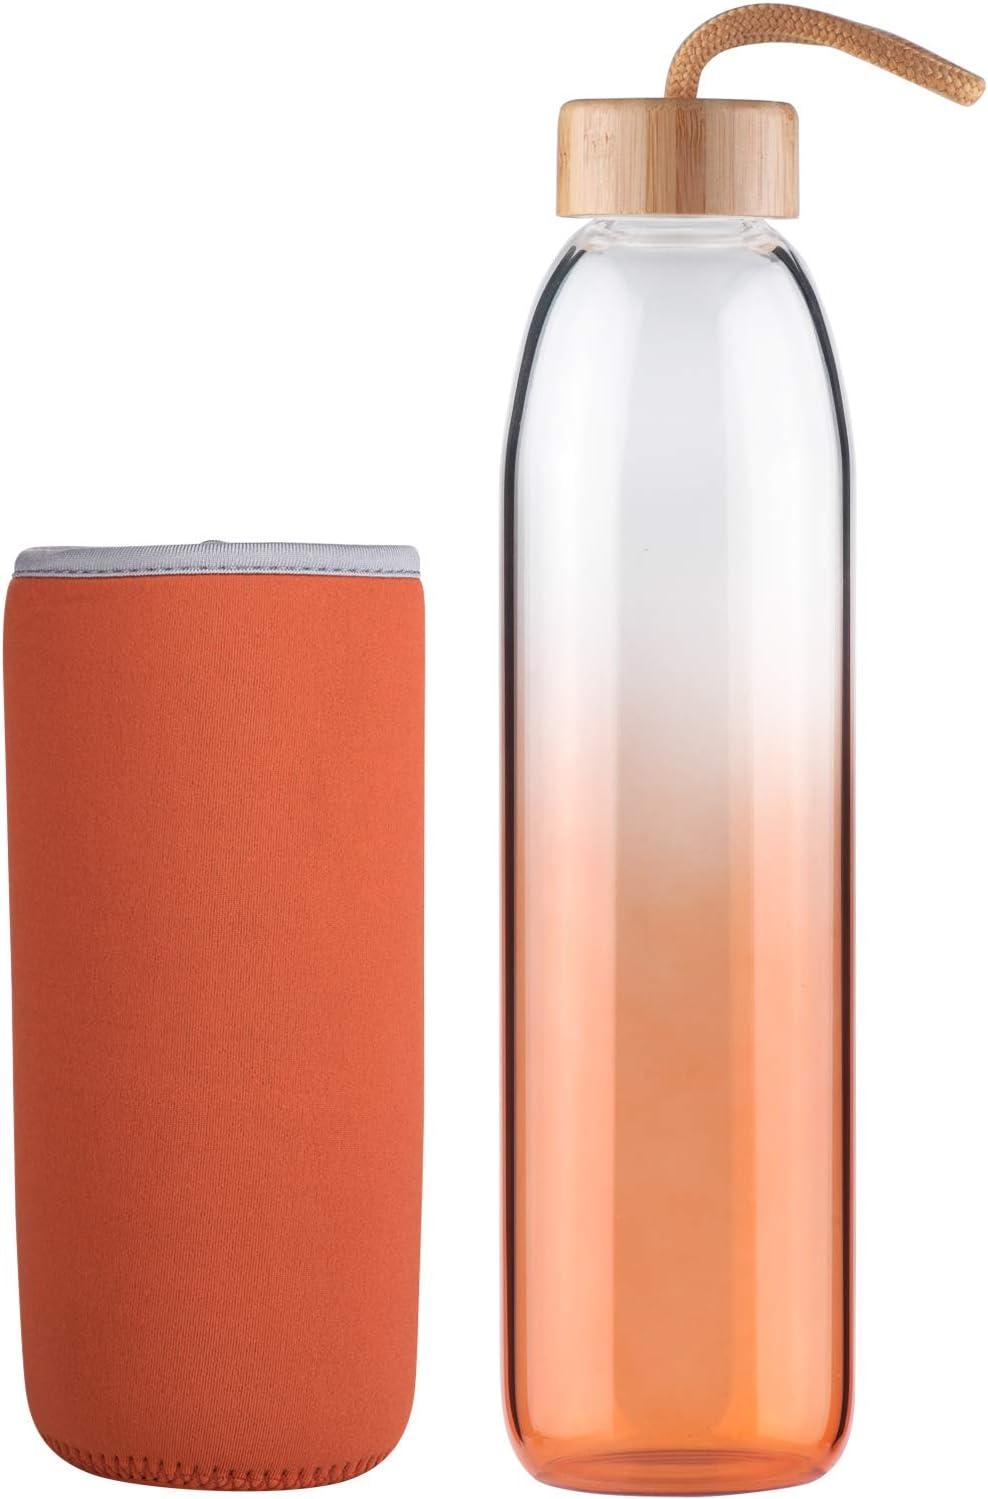 Life4u Botella de Agua de Cristal de Borosilicato de con Funda de Neopreno Sin BPA 500 ml / 1000 ml